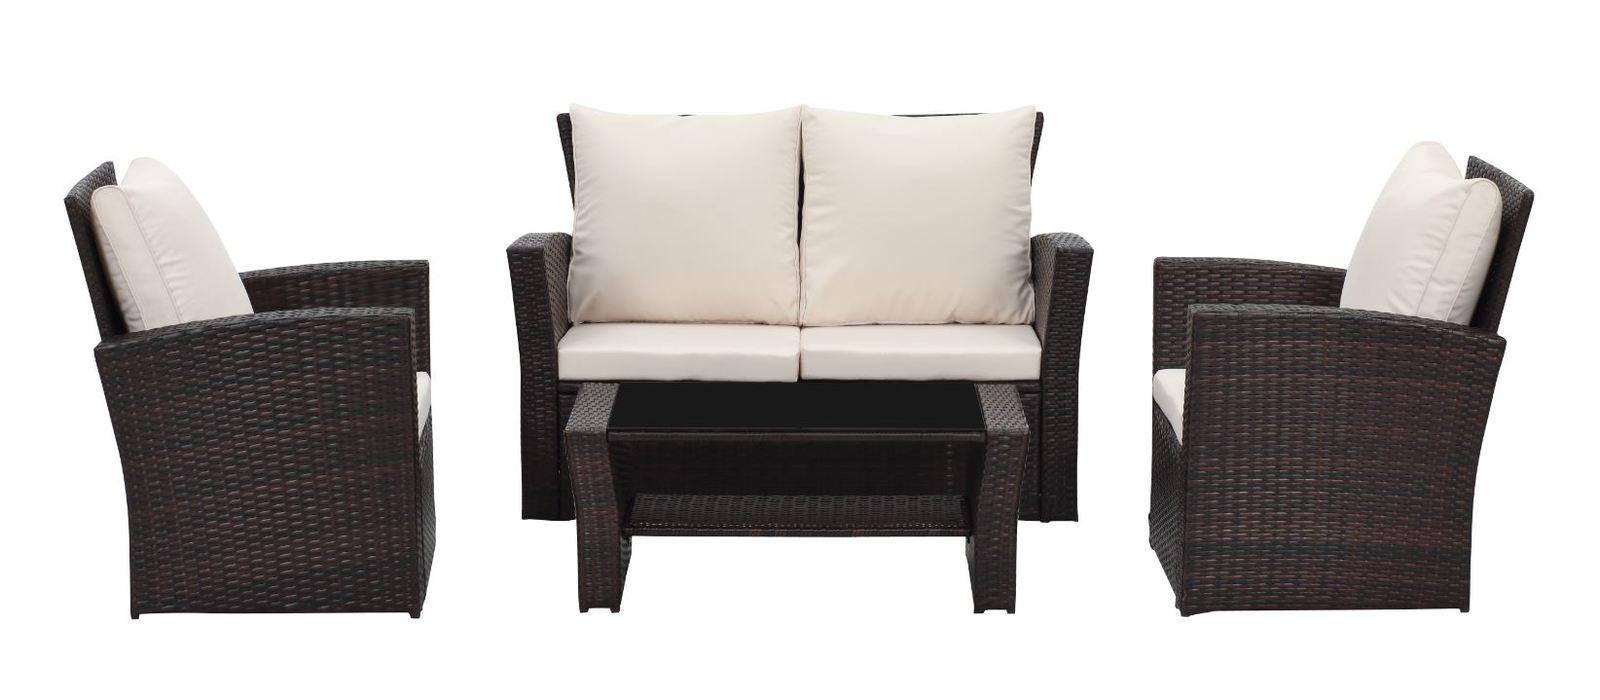 Rattan Wicker Outdoor Sofa Paradise Lounge Set 2 - Beige/Brown image